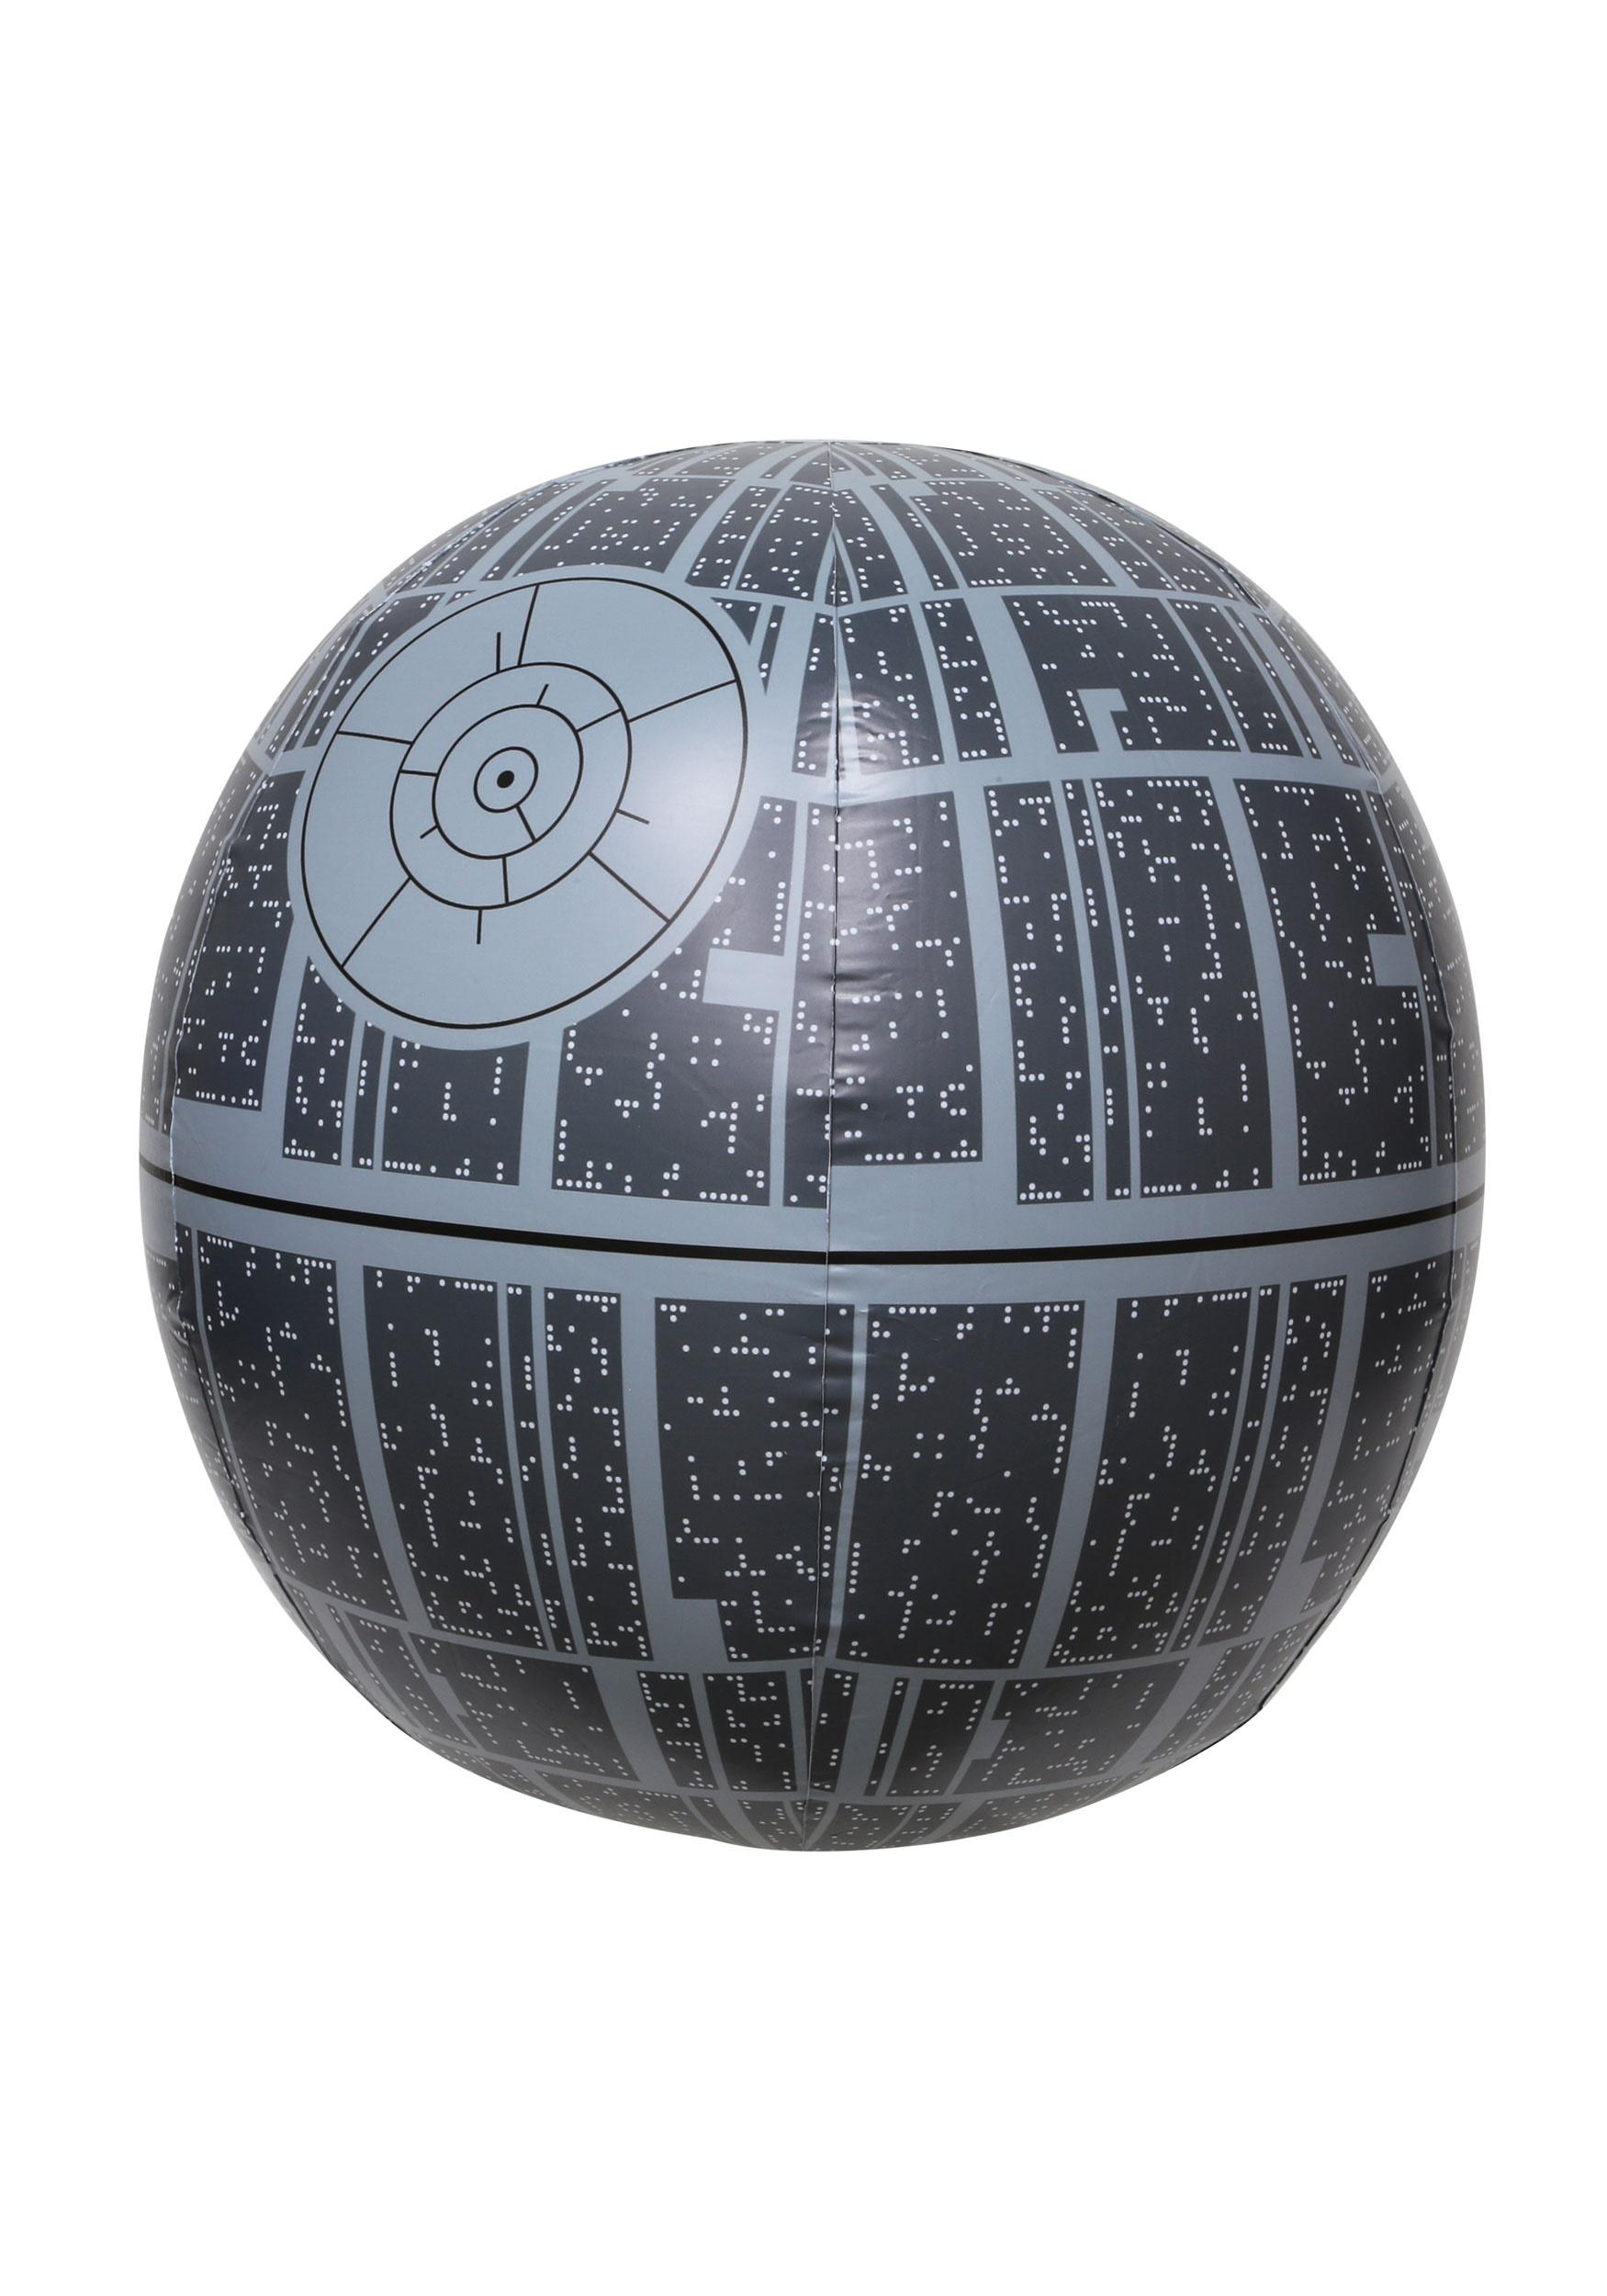 Death Star Light-Up Inflatable Star Wars Beach Ball SWM29002